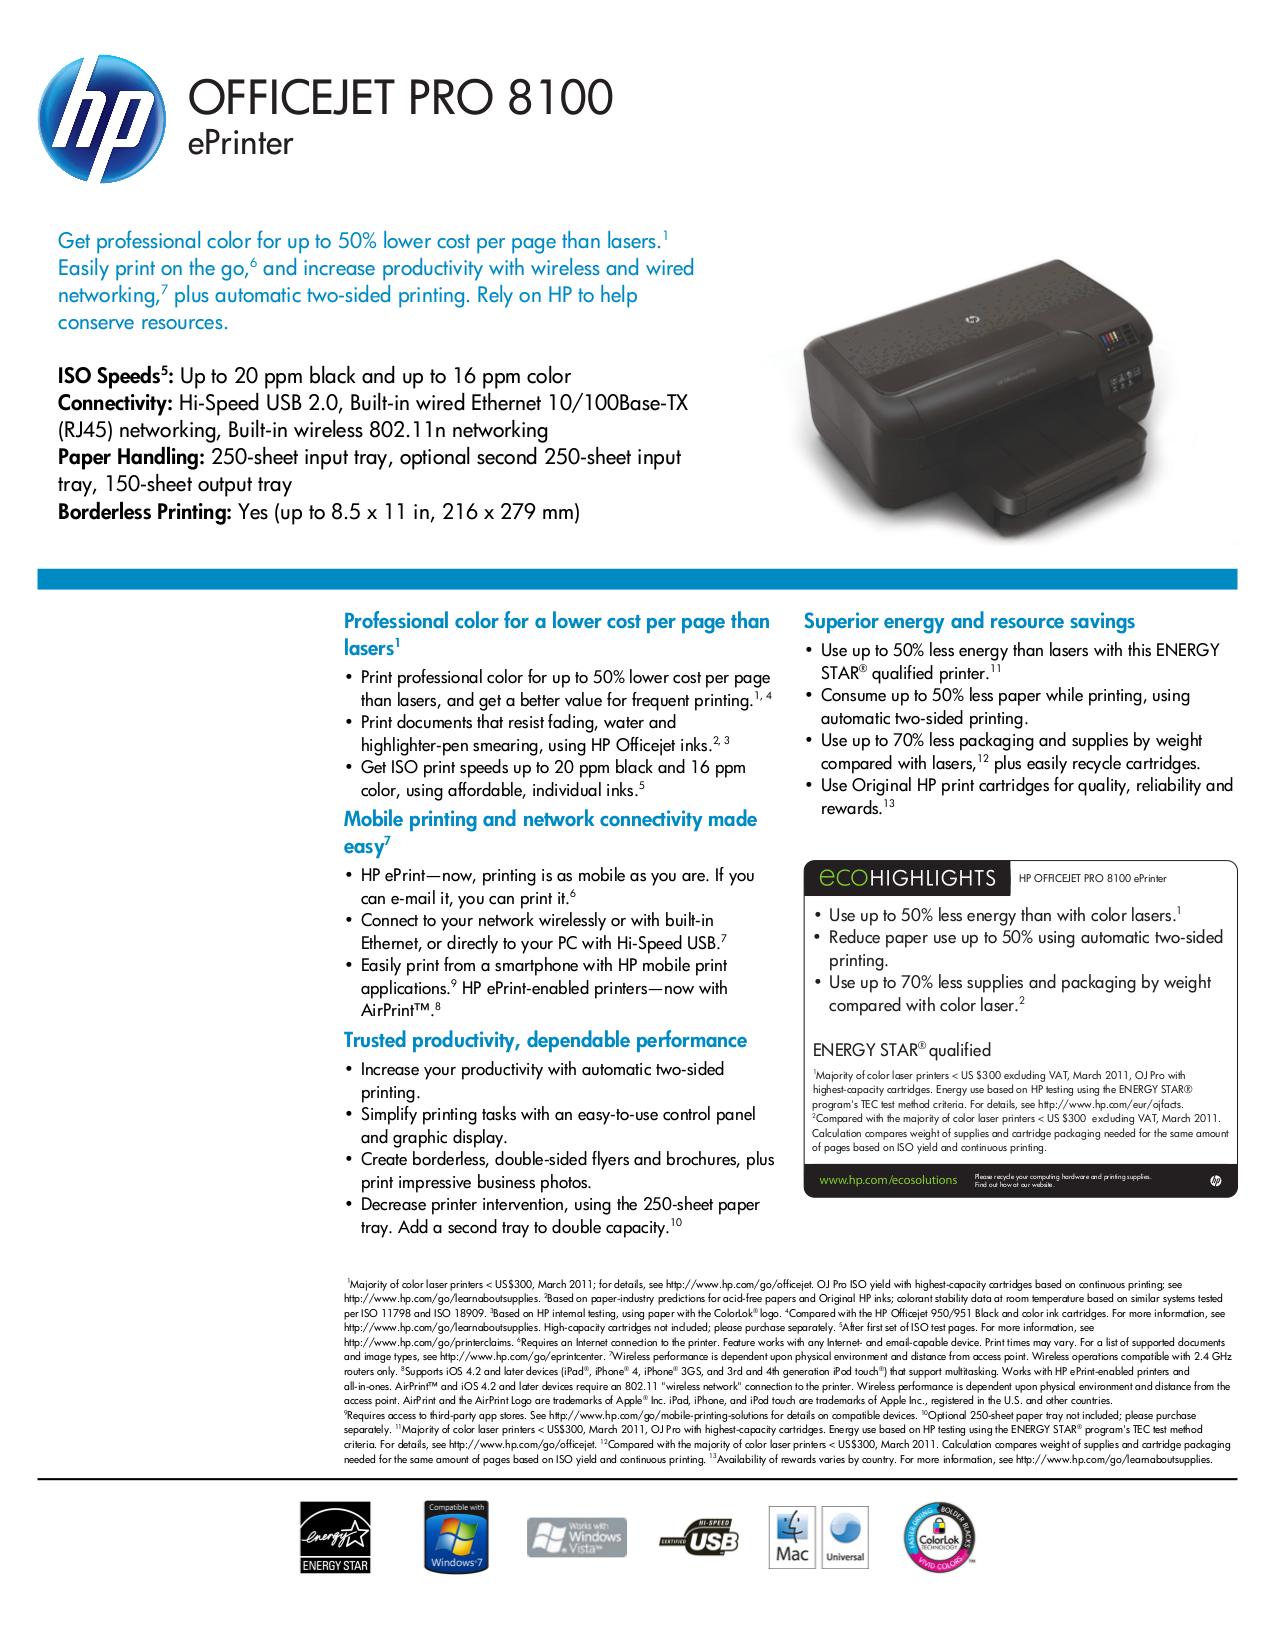 Hp laserjet 8100 Manual